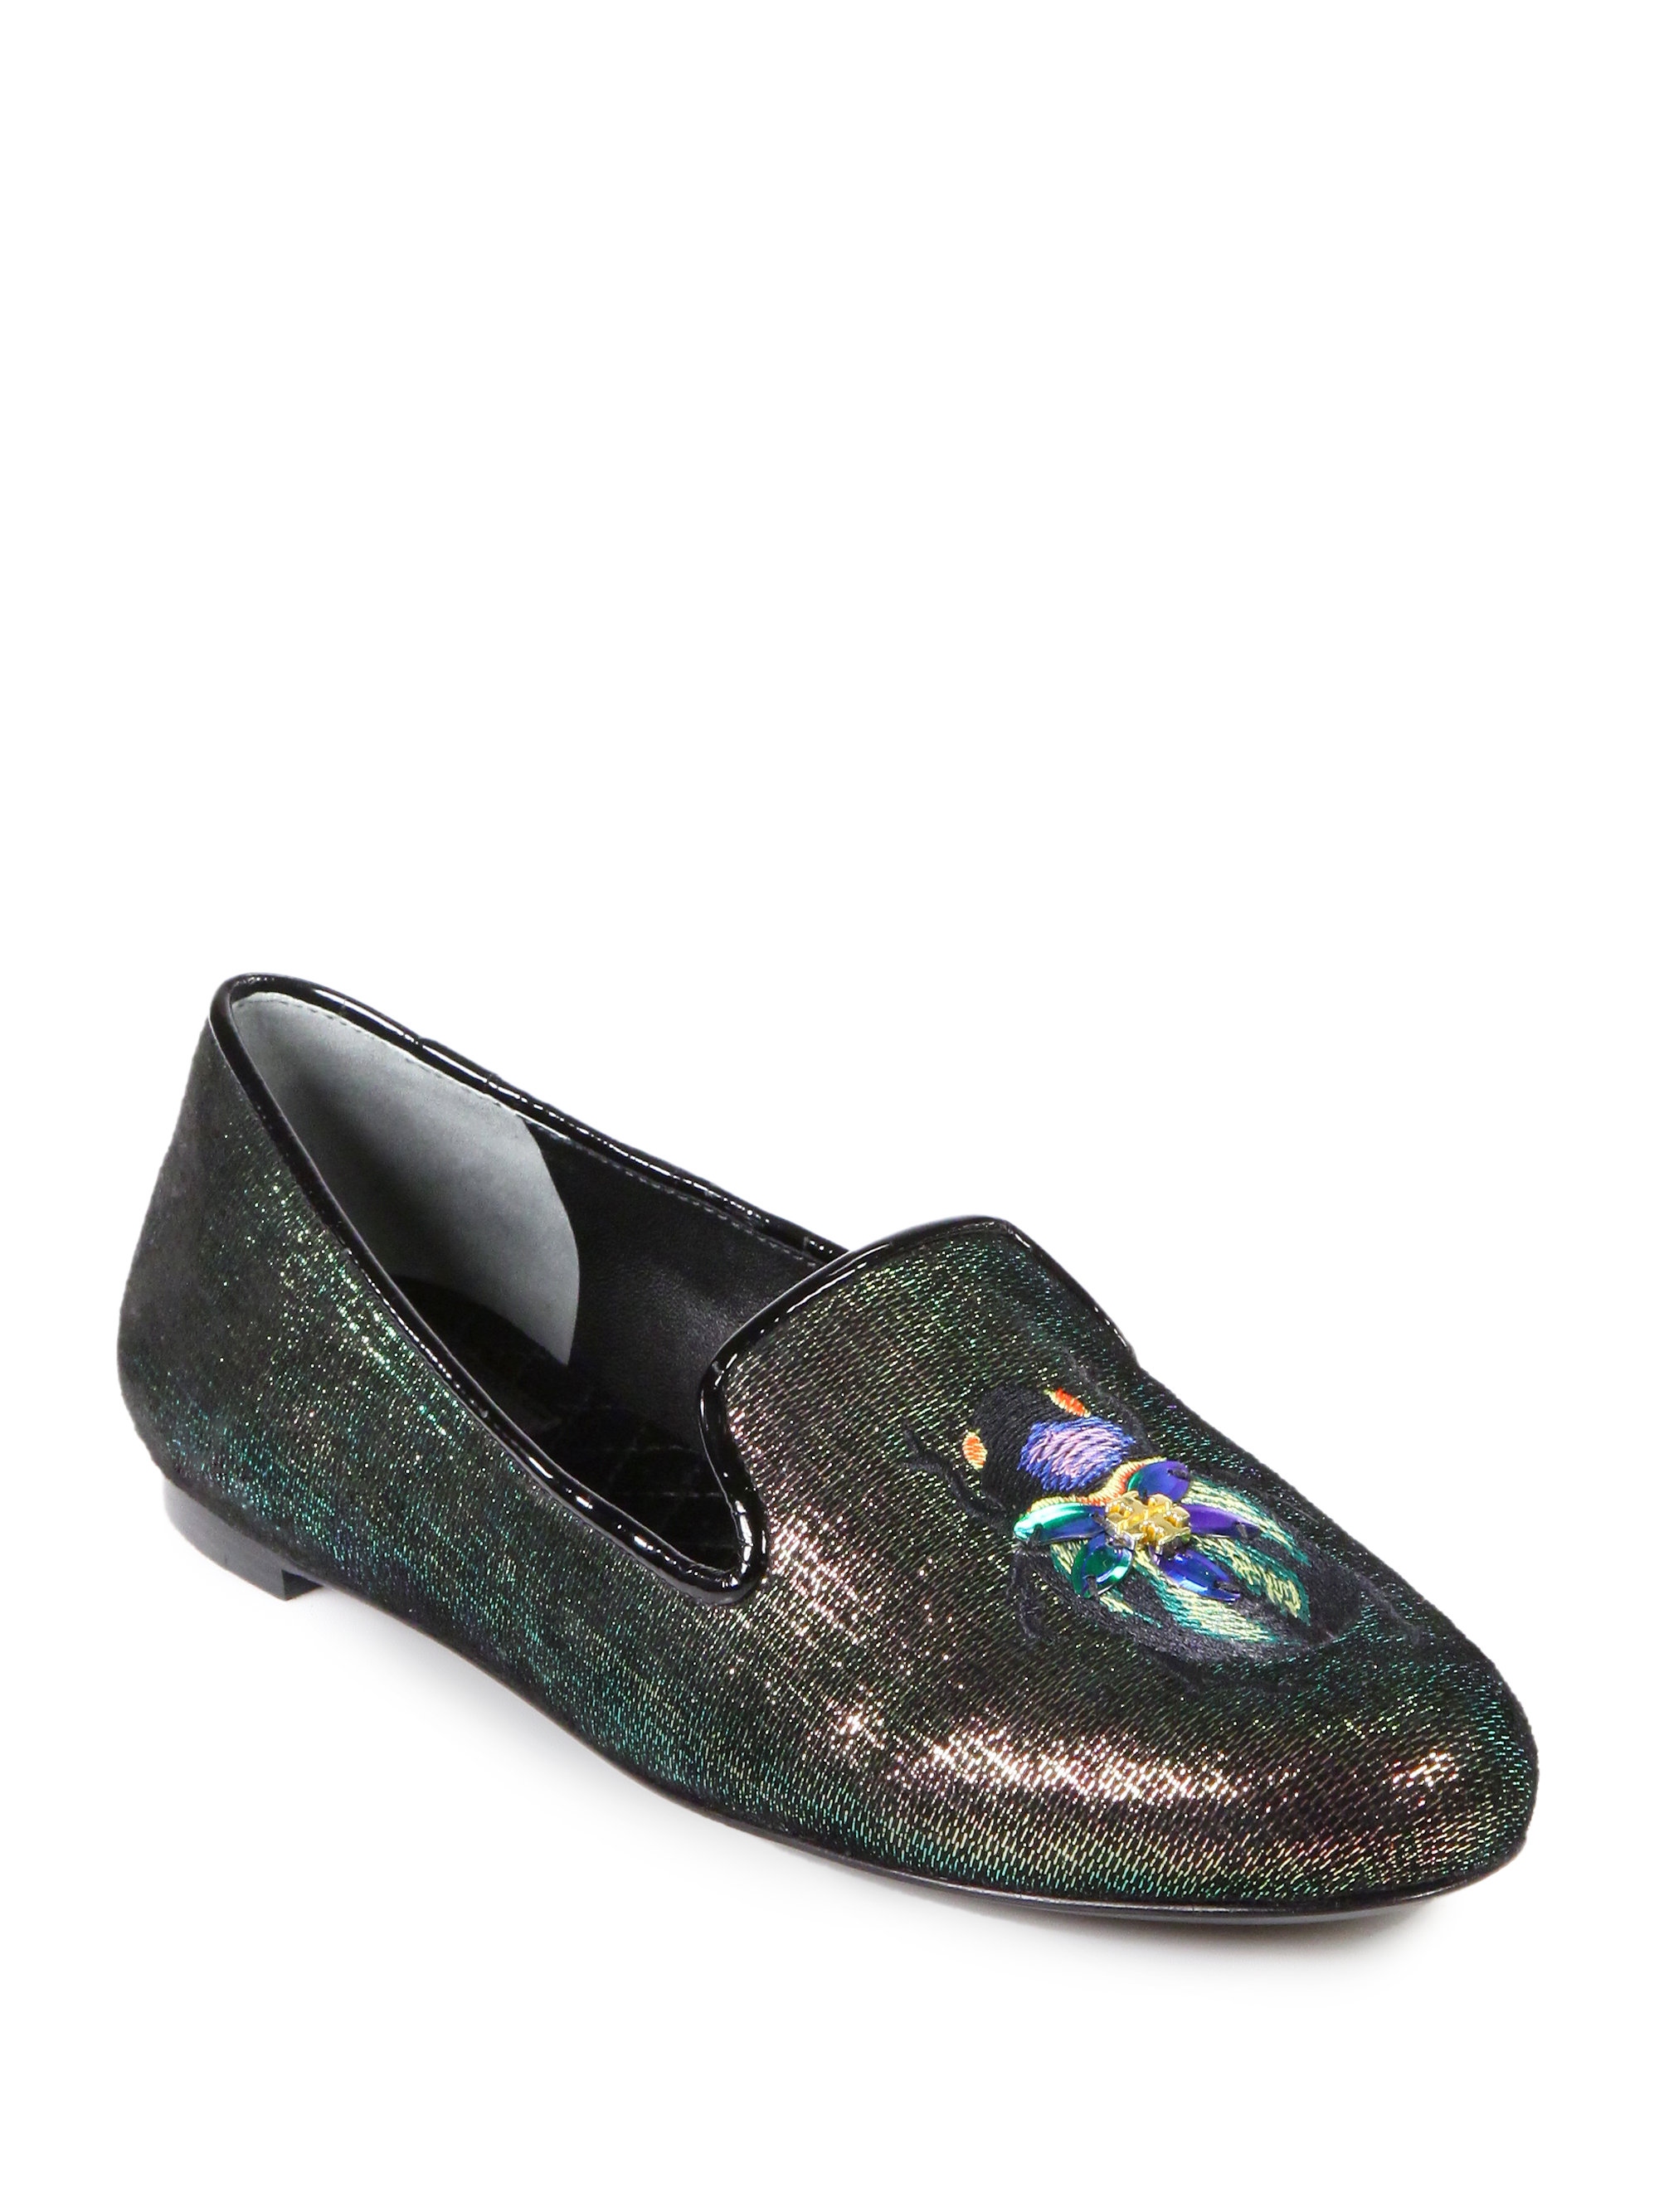 Mimco Shoes Flats